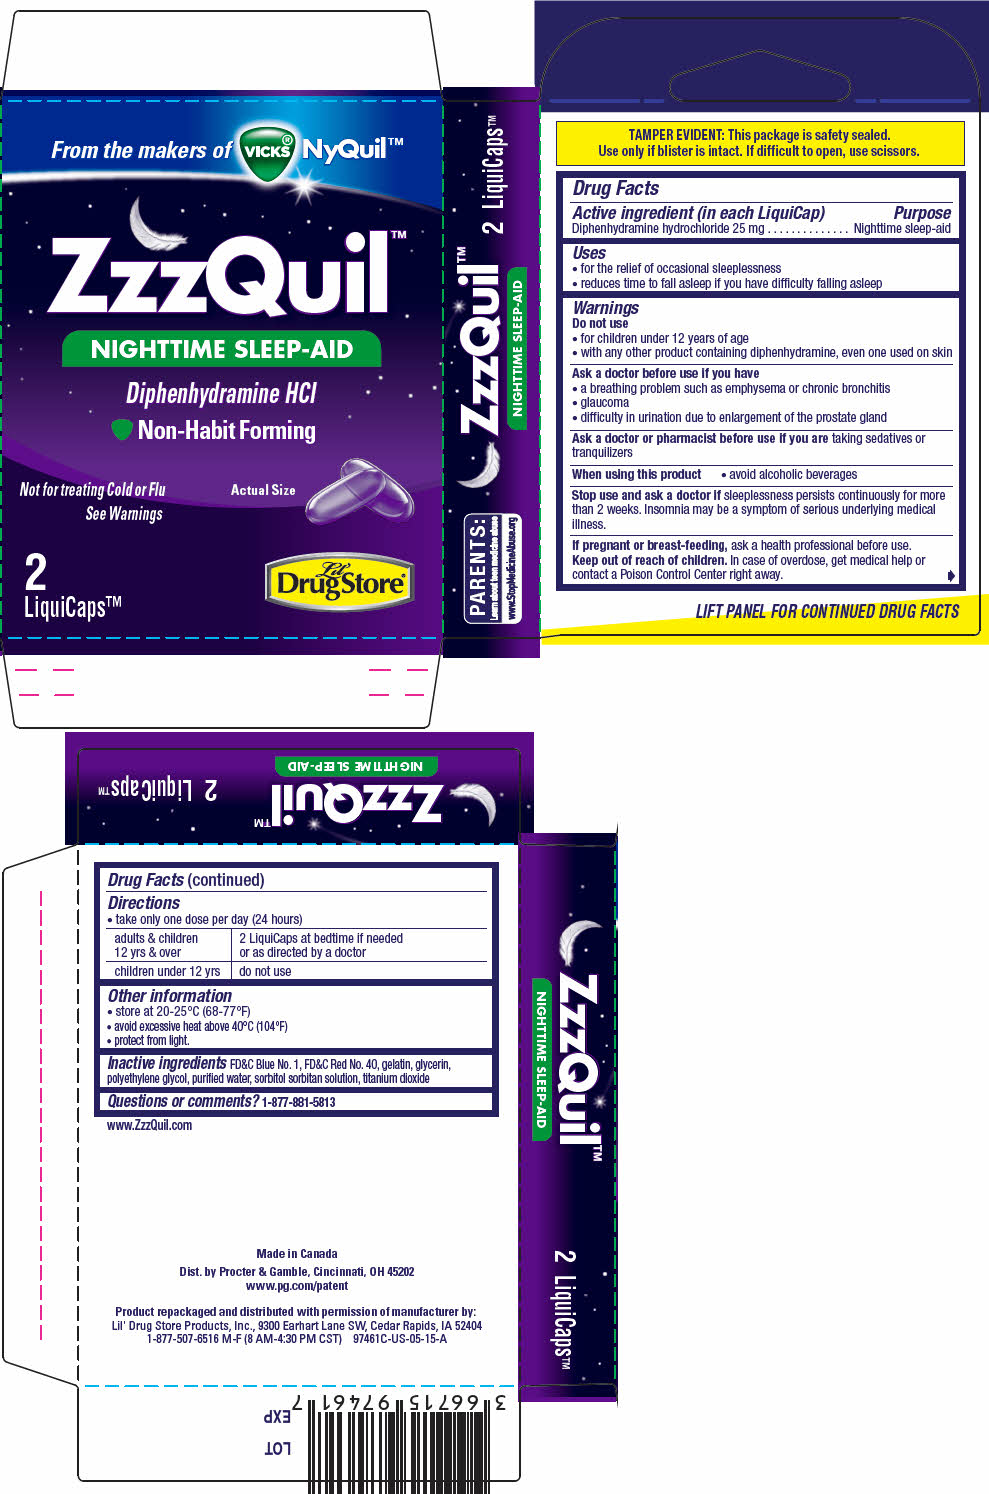 PRINCIPAL DISPLAY PANEL - 2 LiquiCap Blister Pack Carton